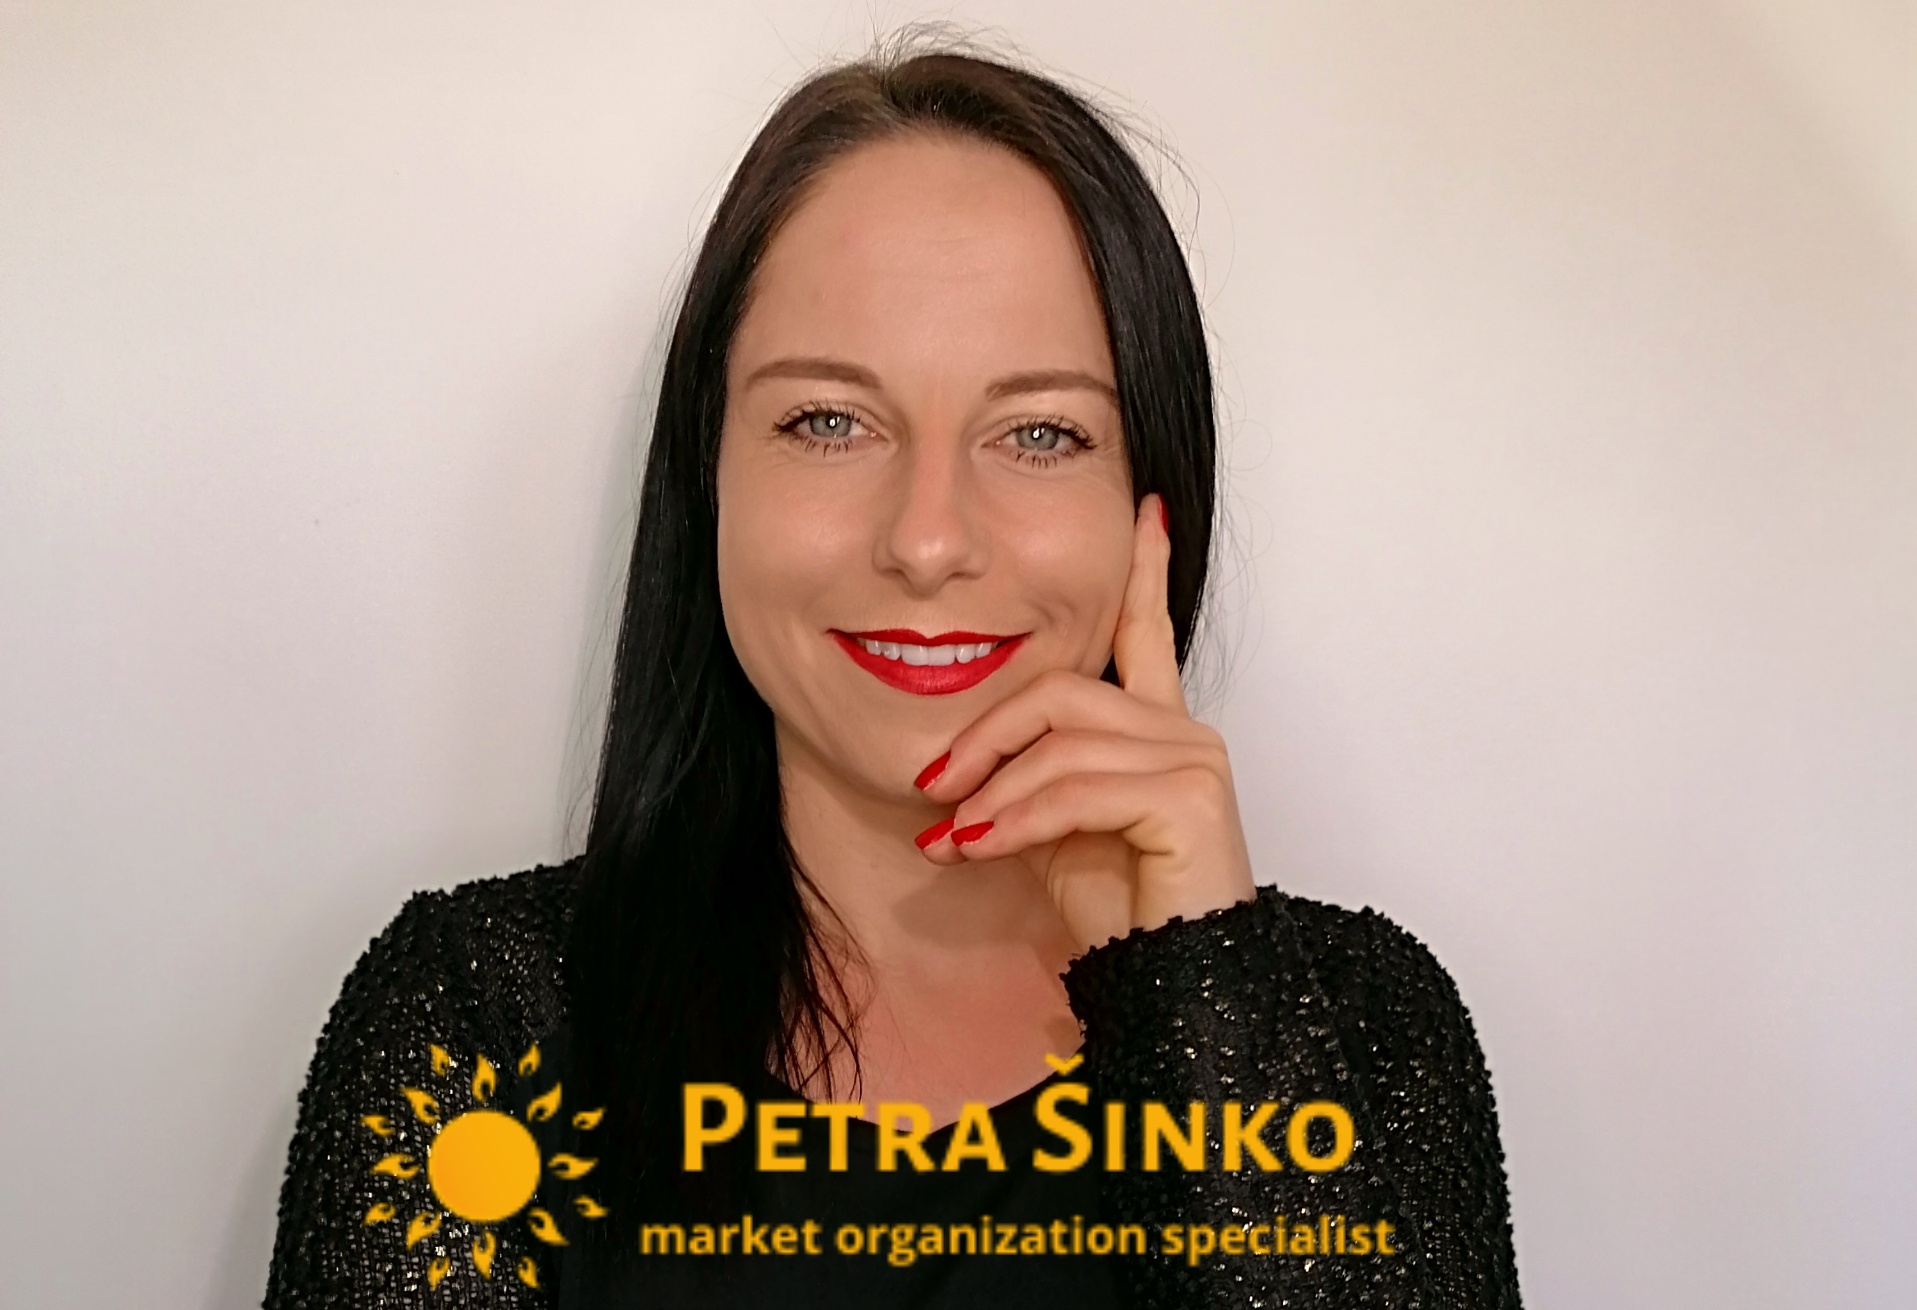 Petra Šinko — market organization specialist